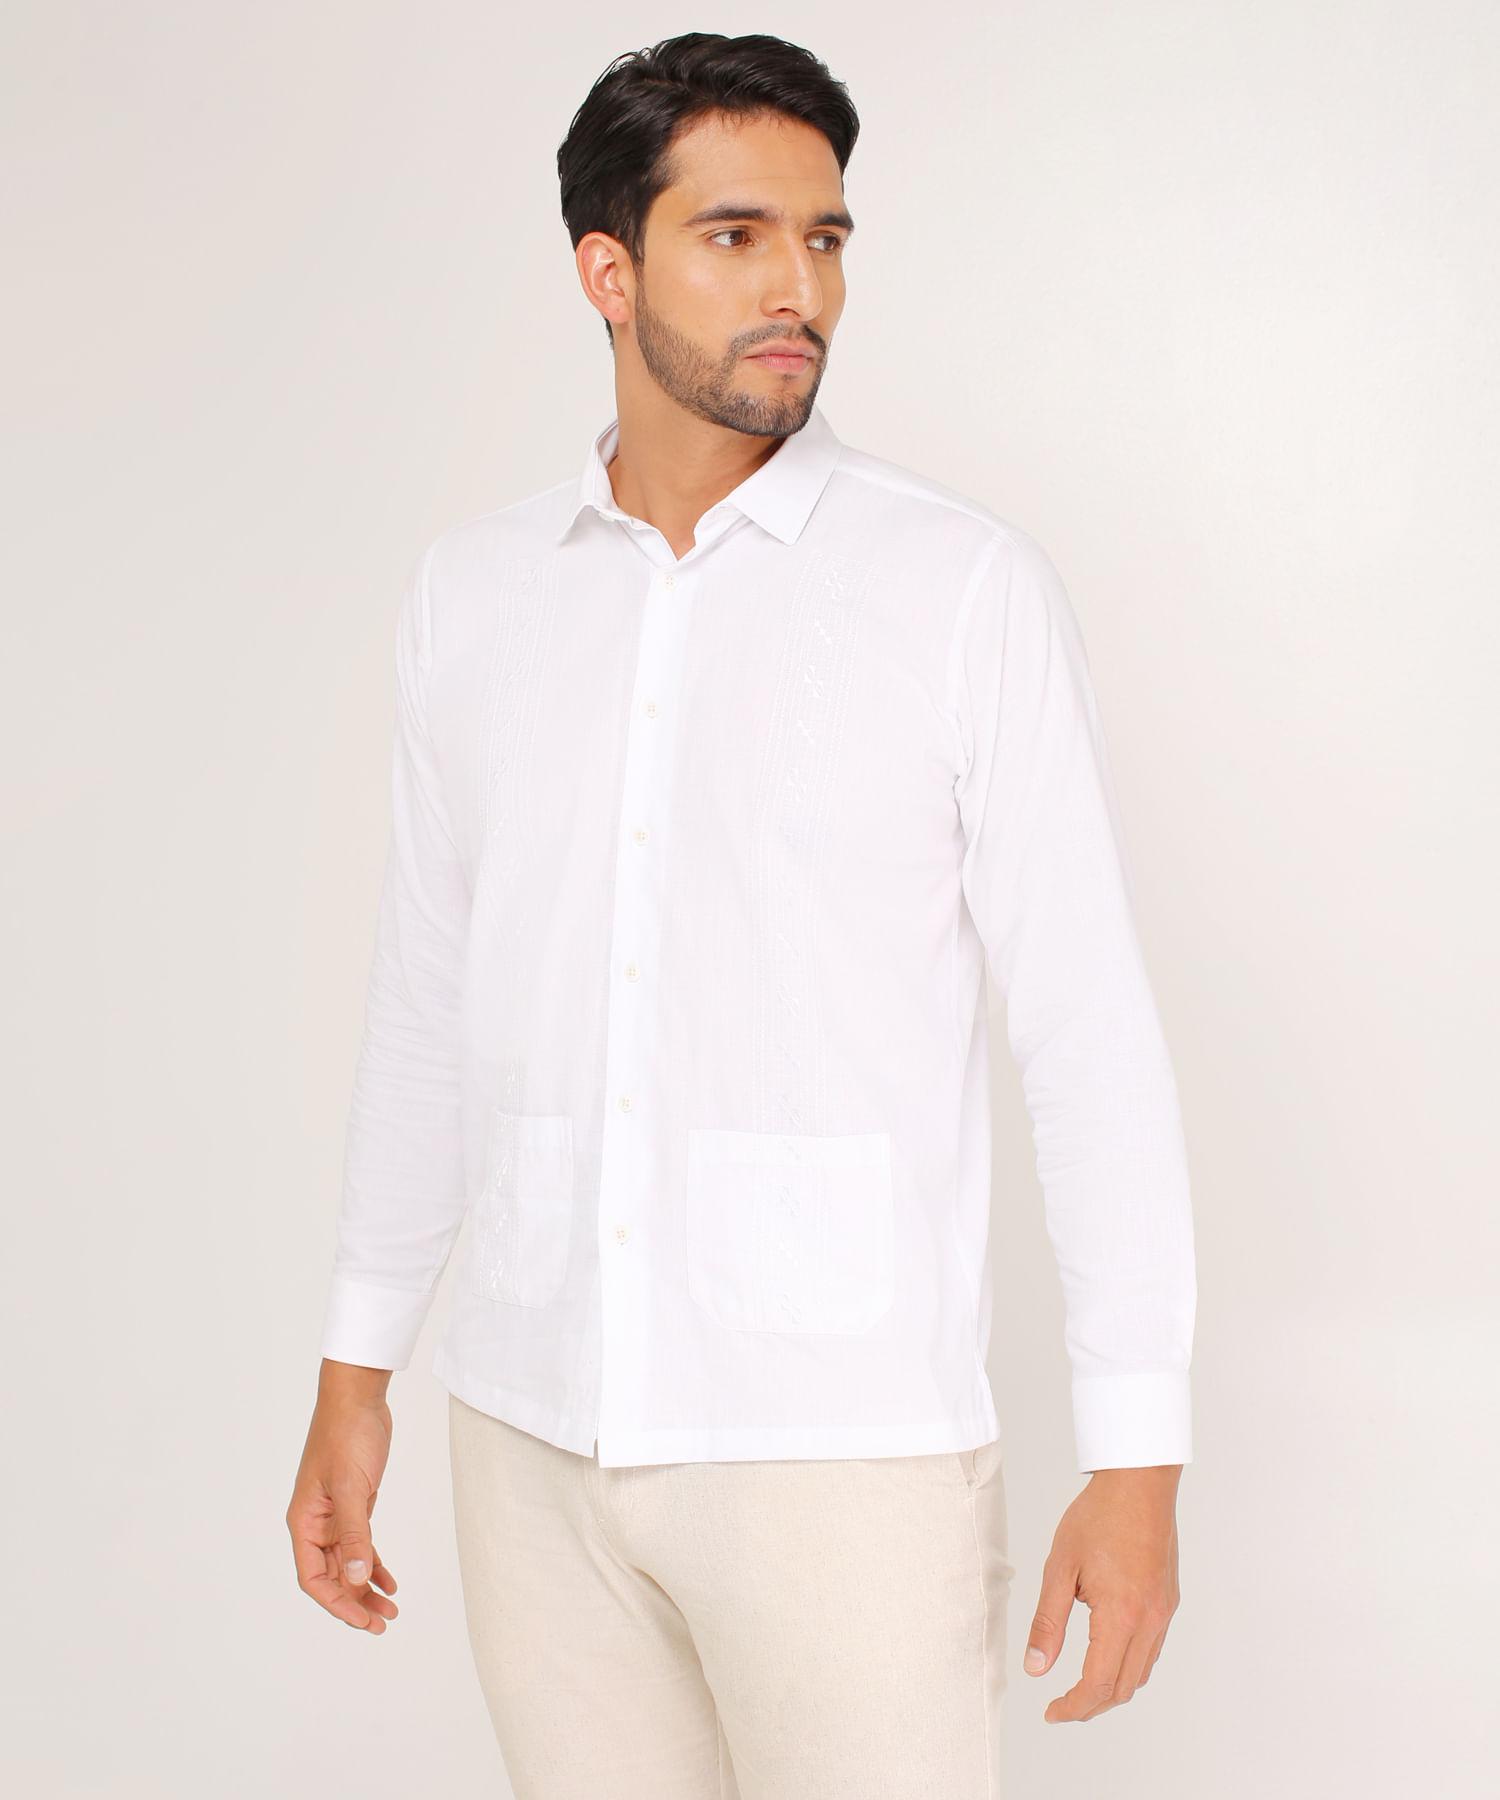 272c315ce Camisa Guayabera Para Hombre Unicolor Blanca 44030256 - Patprimo